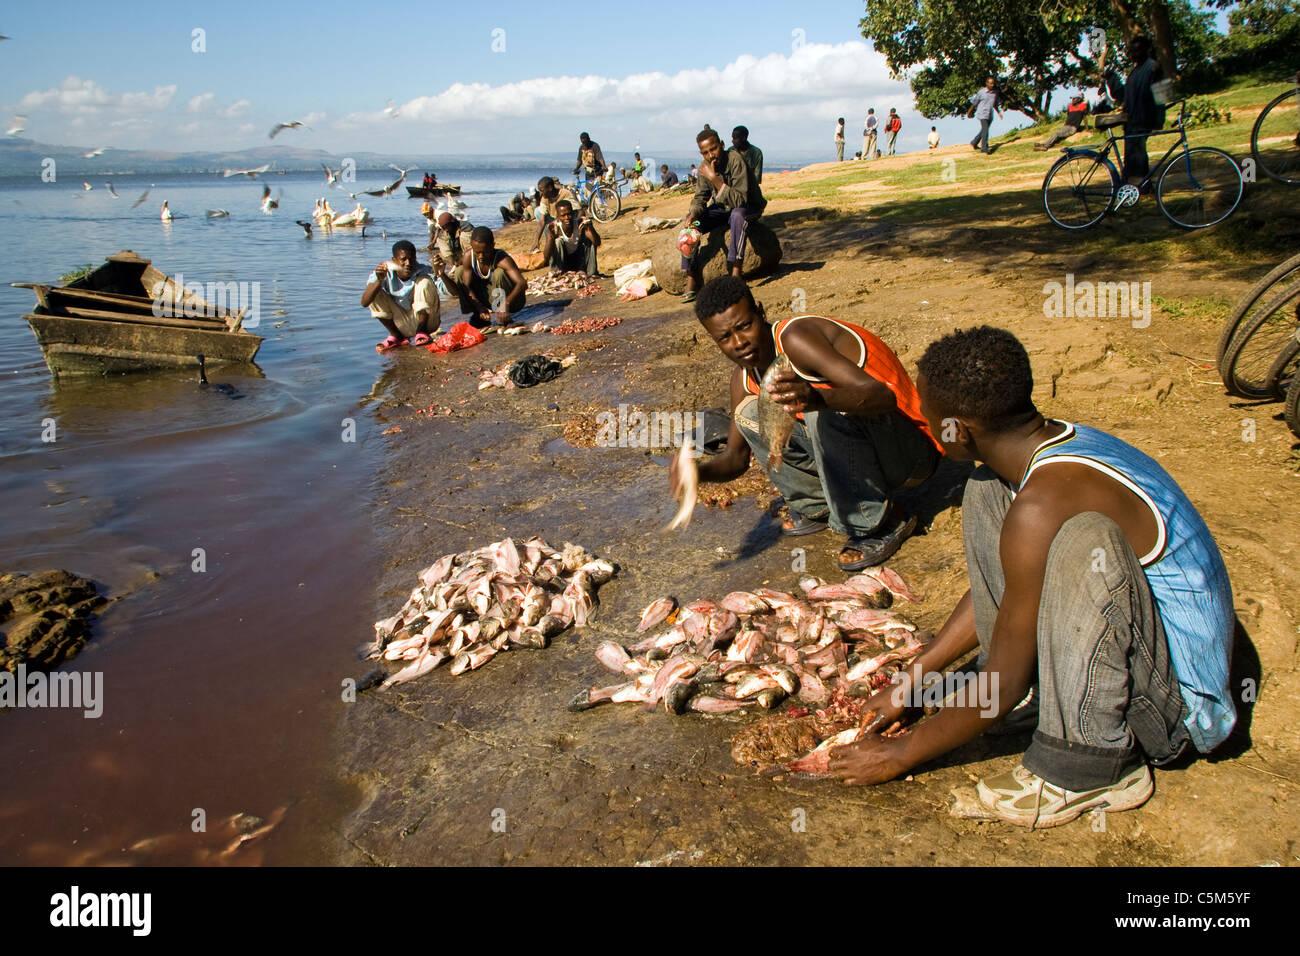 Fishermen Lake Awasa Ethiopia - Stock Image